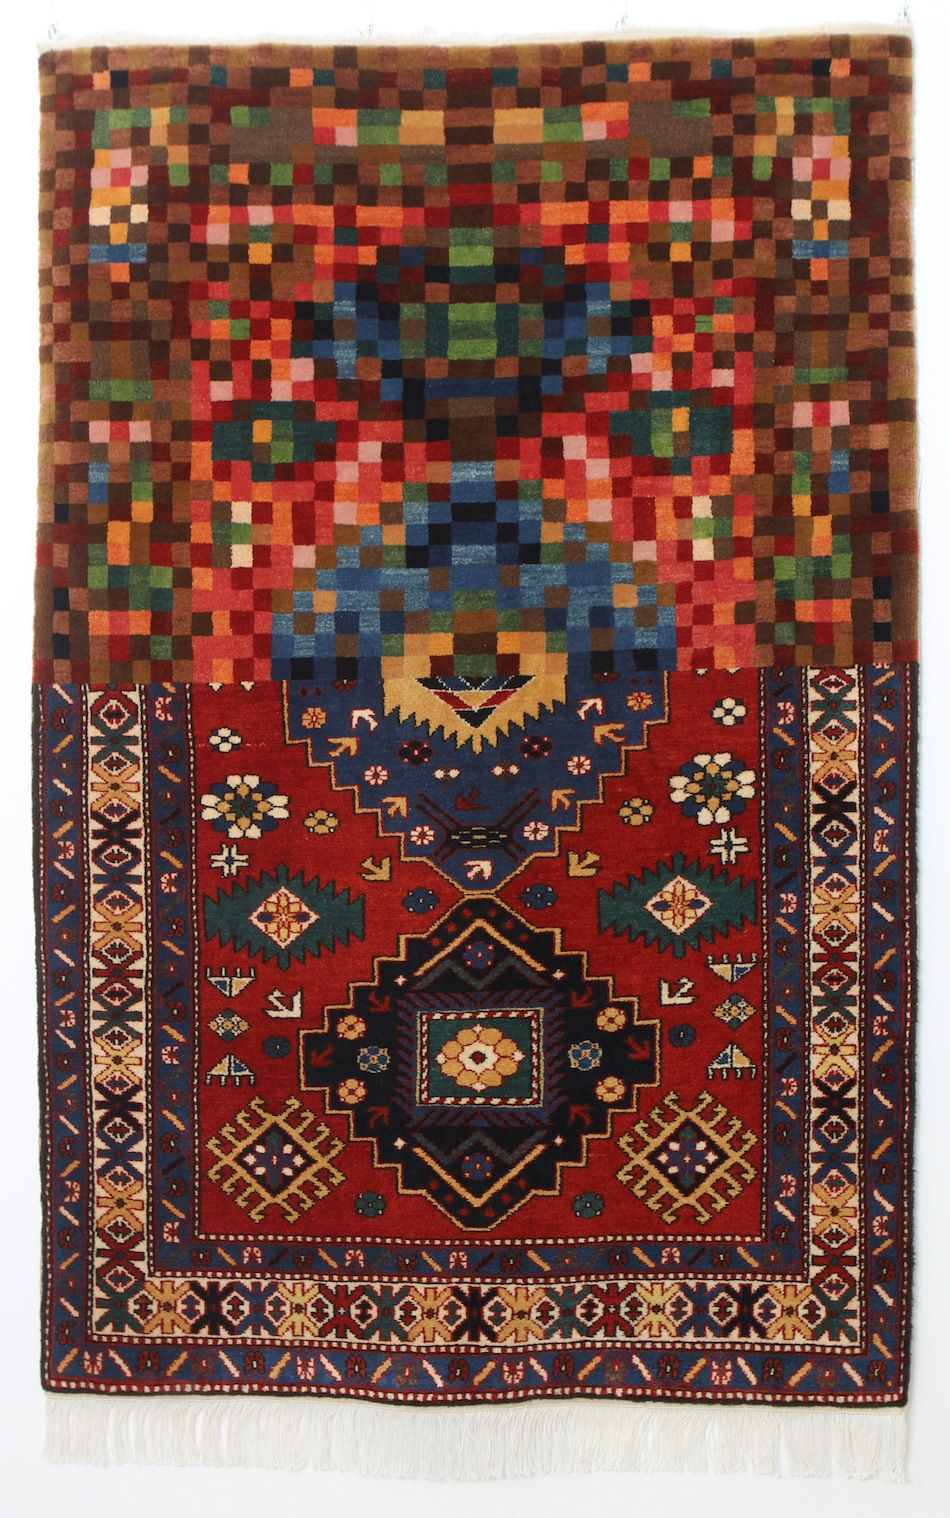 Faig Ahmed textile traditional Azerbaijani rugs 7